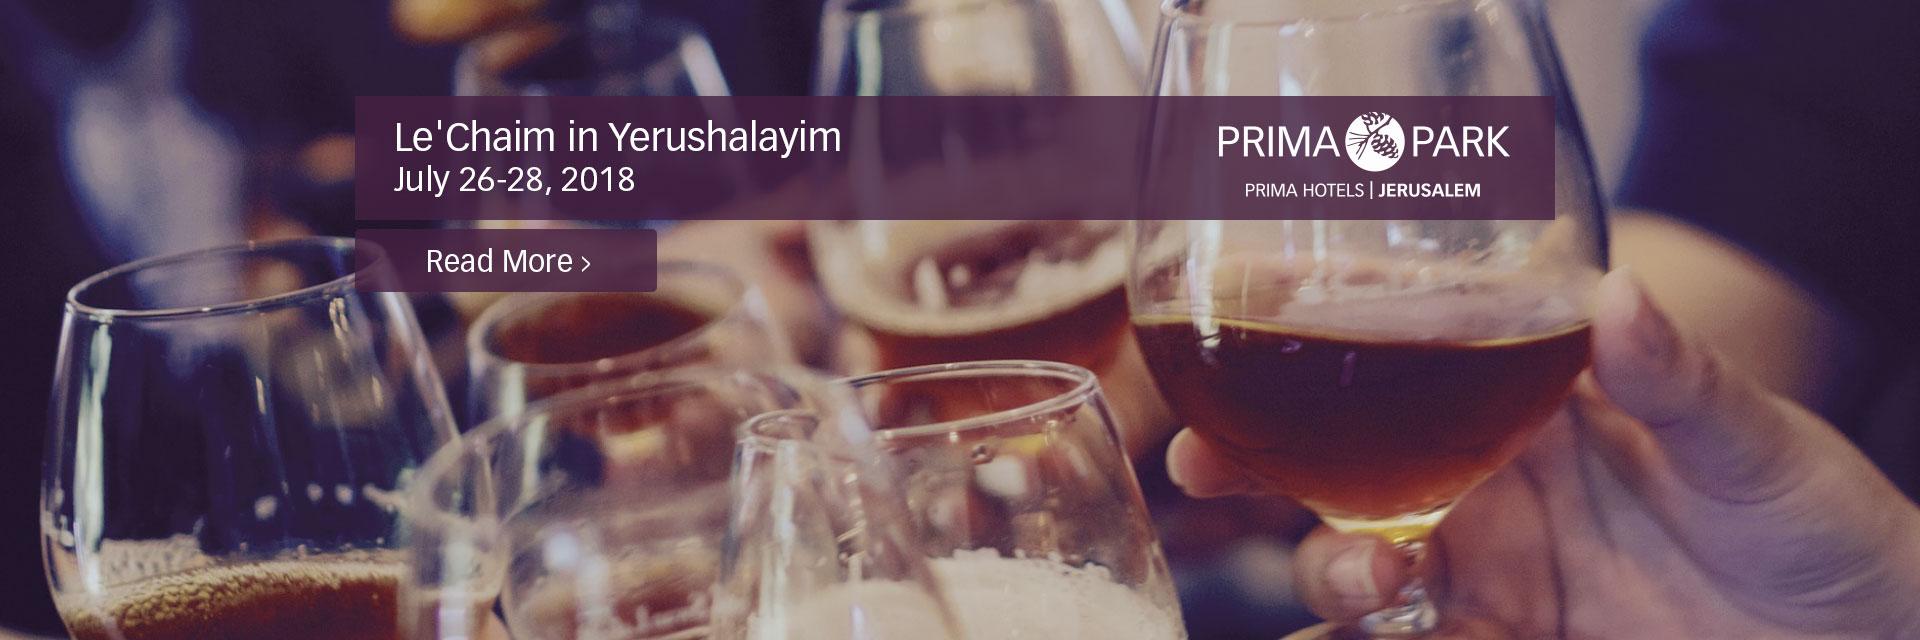 Le'Chaim in Yerushalayim Weekend